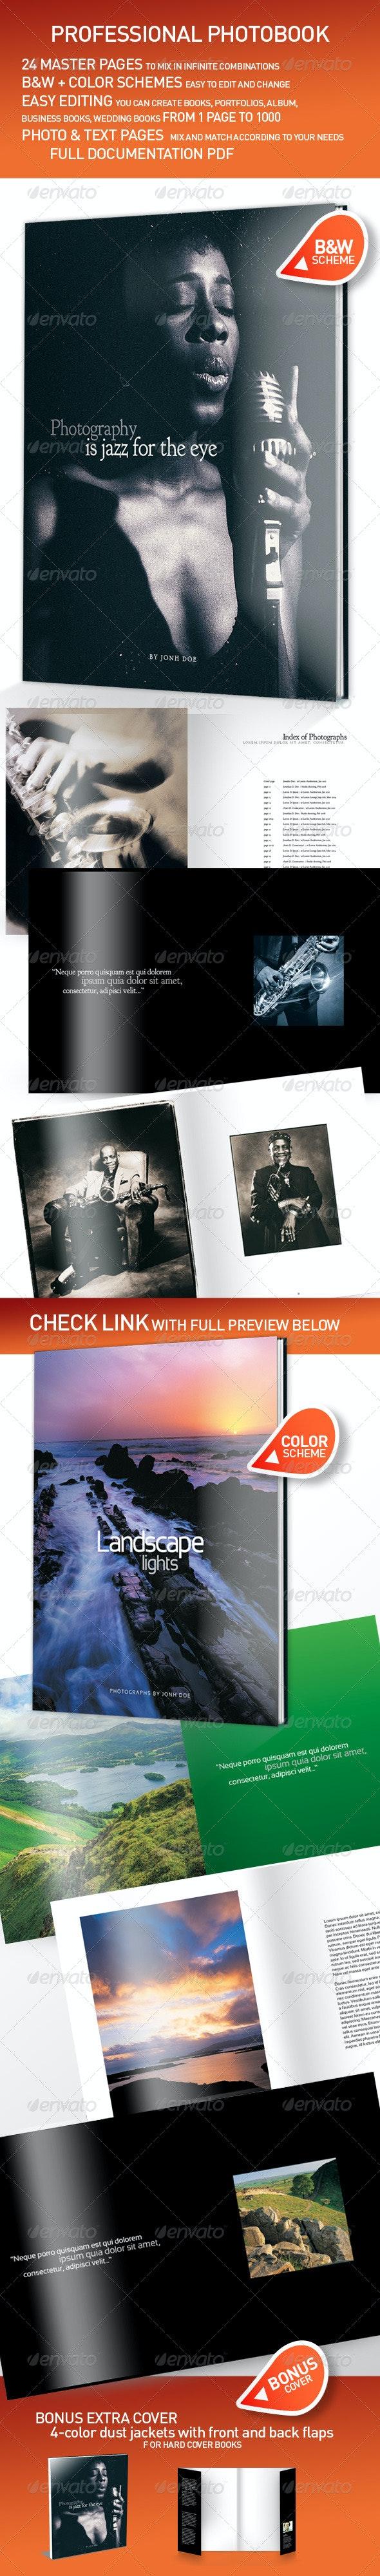 Professional Photobook Template InDesign - Photo Albums Print Templates